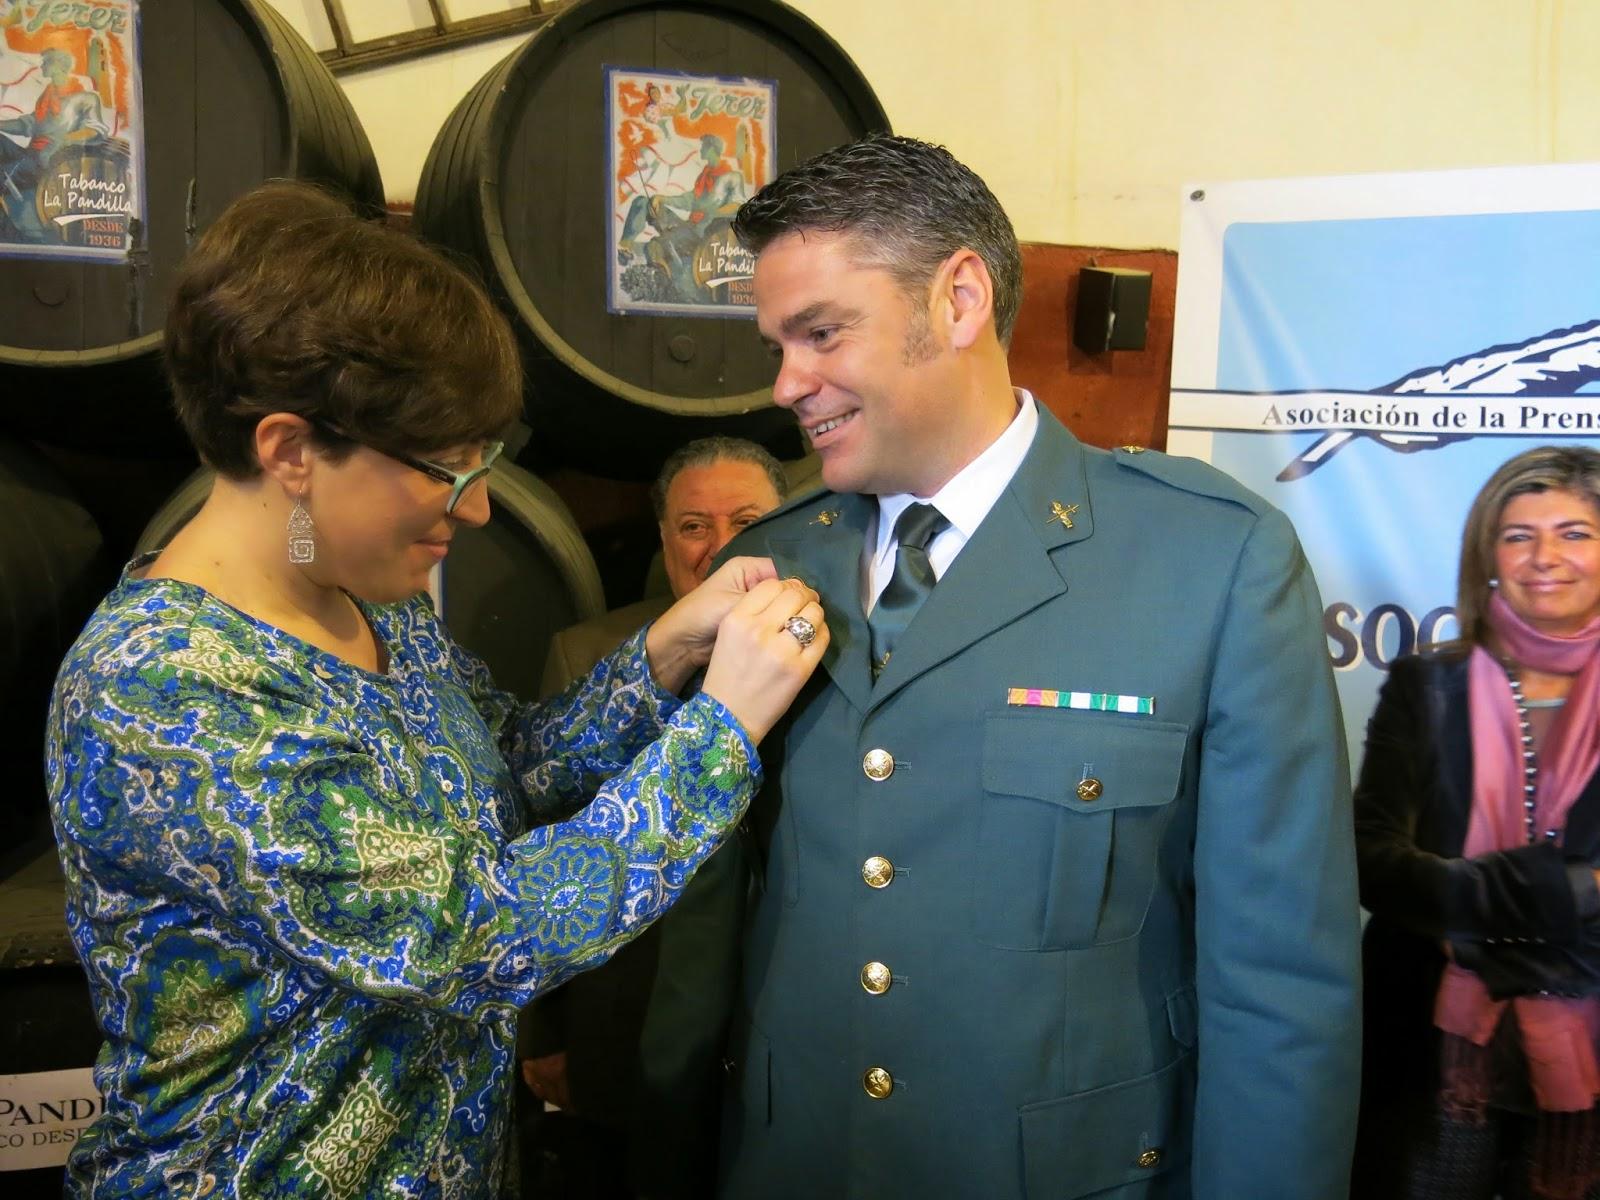 El portavoz de la Comandancia de la Guardia Civil de Cádiz, Manuel González, recibe el premio Pluma de Oro.